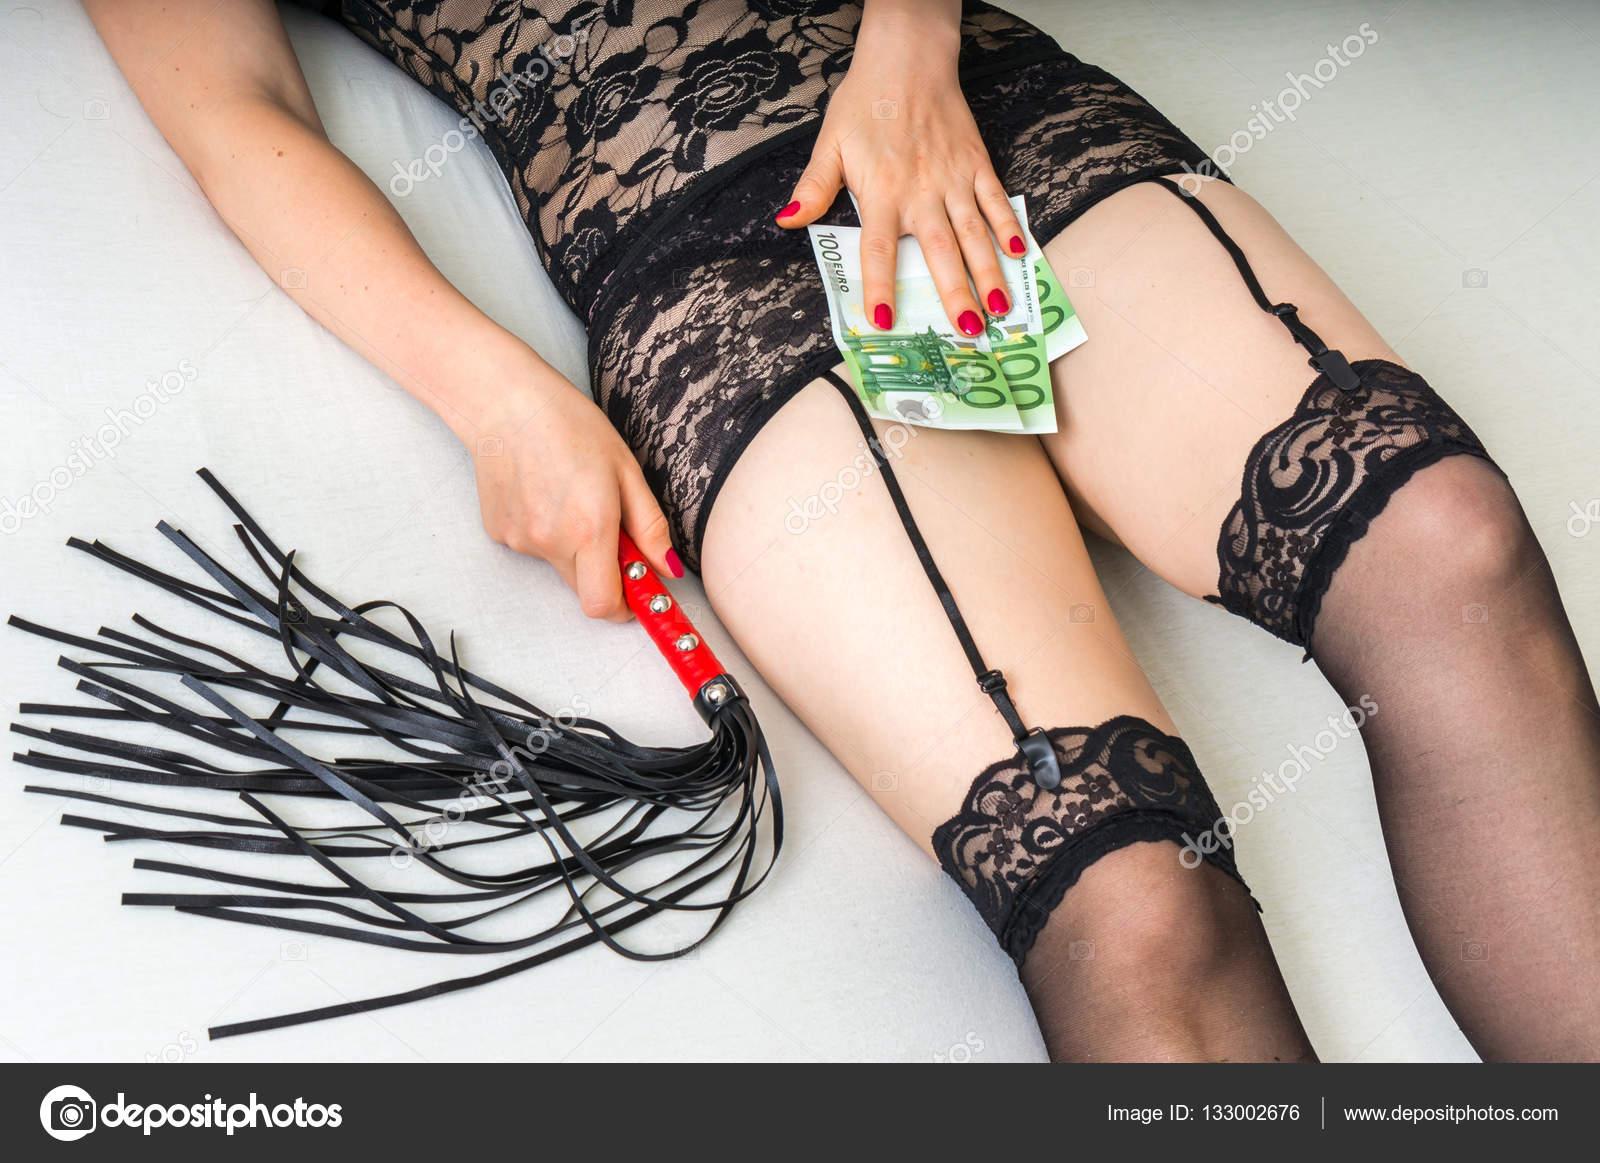 pengar kvinna fetisch